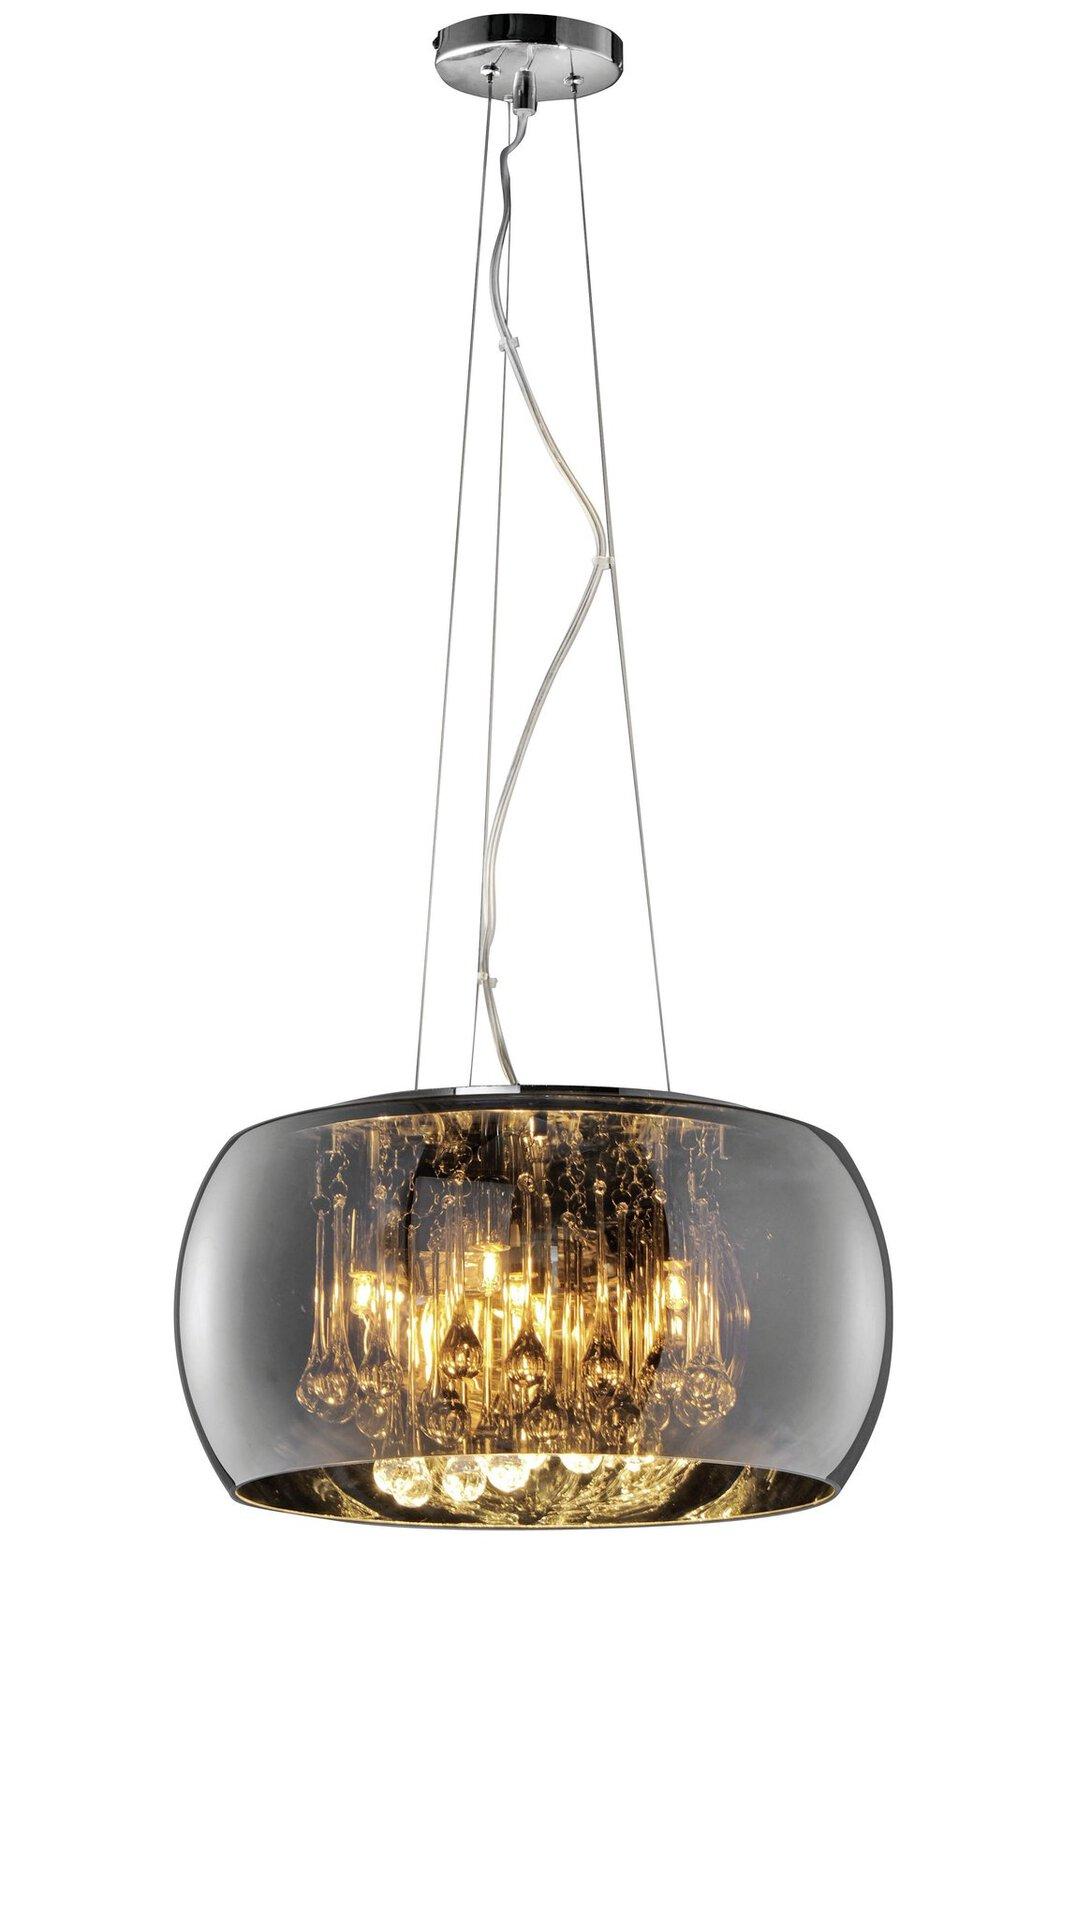 Pendelleuchte Vapore Trio Leuchten Metall silber 40 x 150 x 40 cm